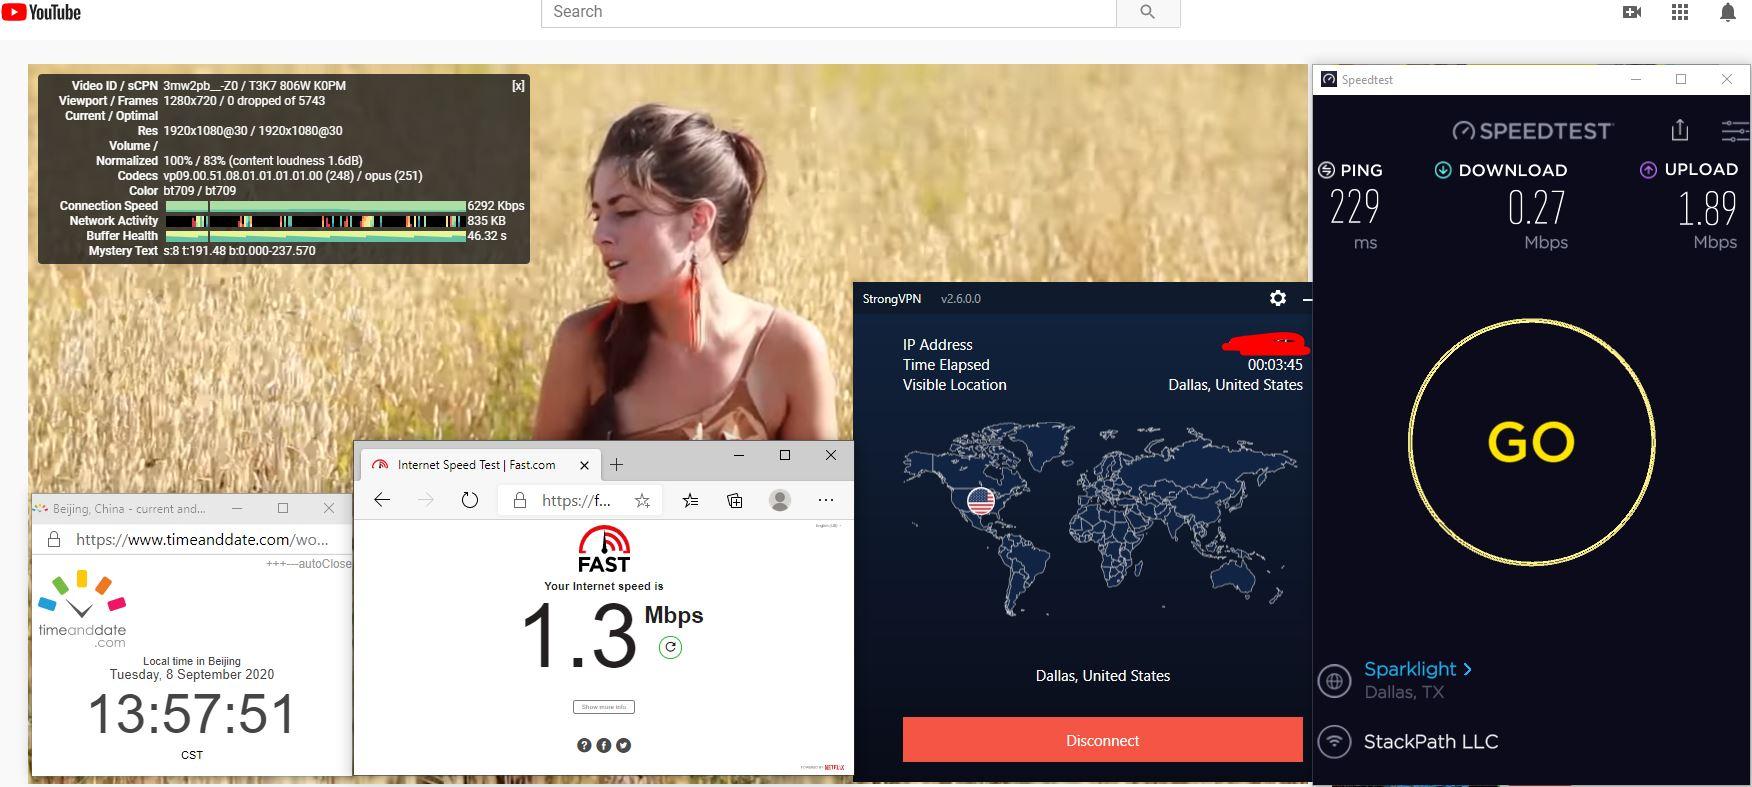 Windows10 StrongVPN USA - Dallas 中国VPN 翻墙 科学上网 翻墙速度测试 - 20200908